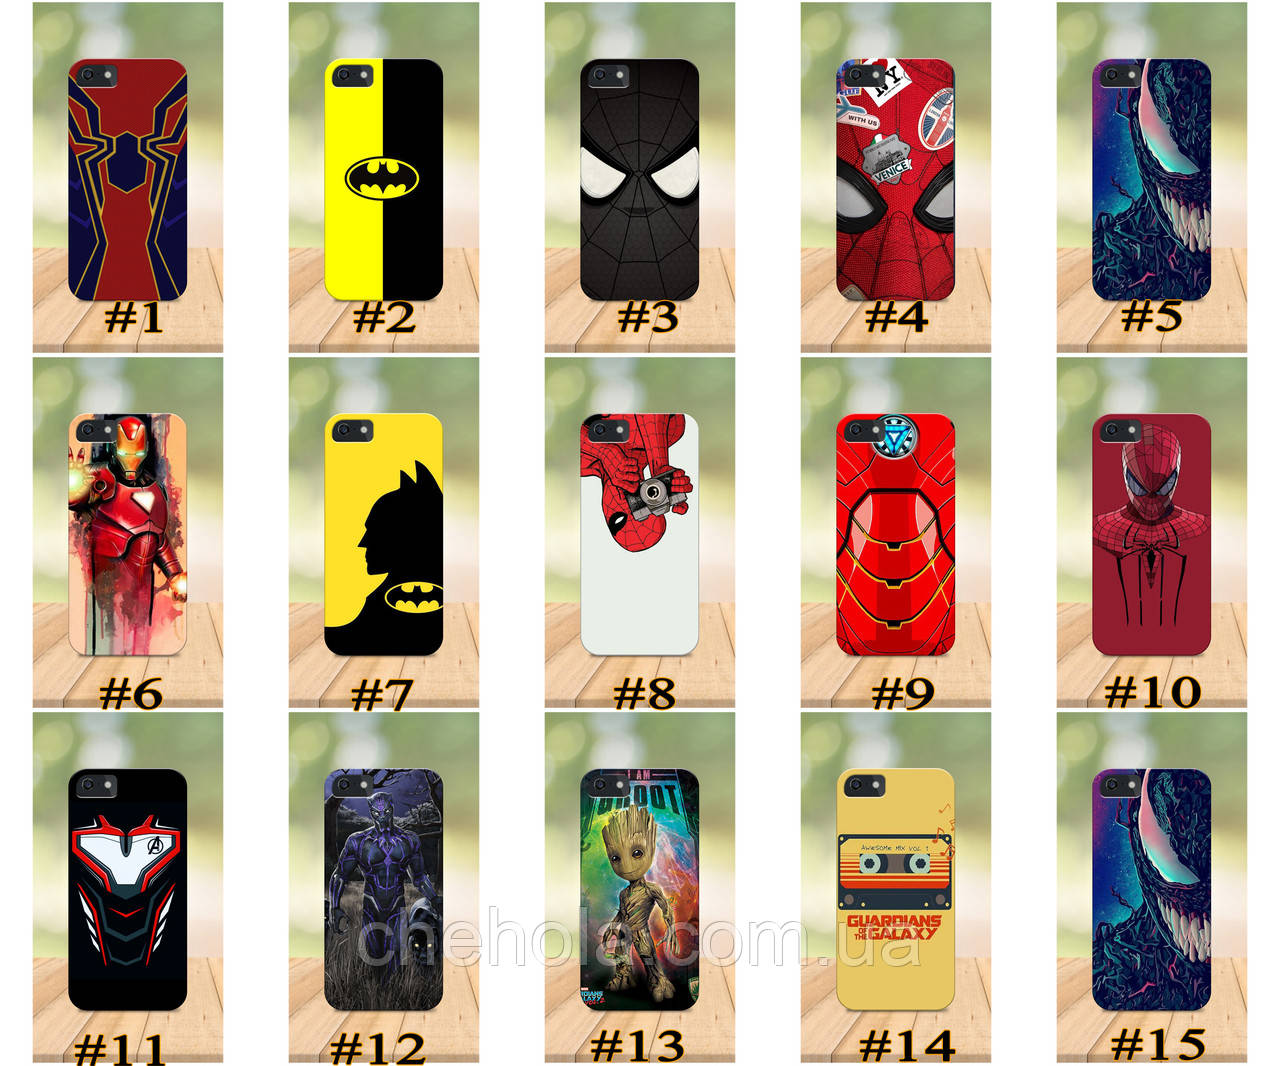 Чехол на iPhone 5 5s SE 4 4S бампер накладка с принтом бампер накладка с принтом Marvel DC Комиксы